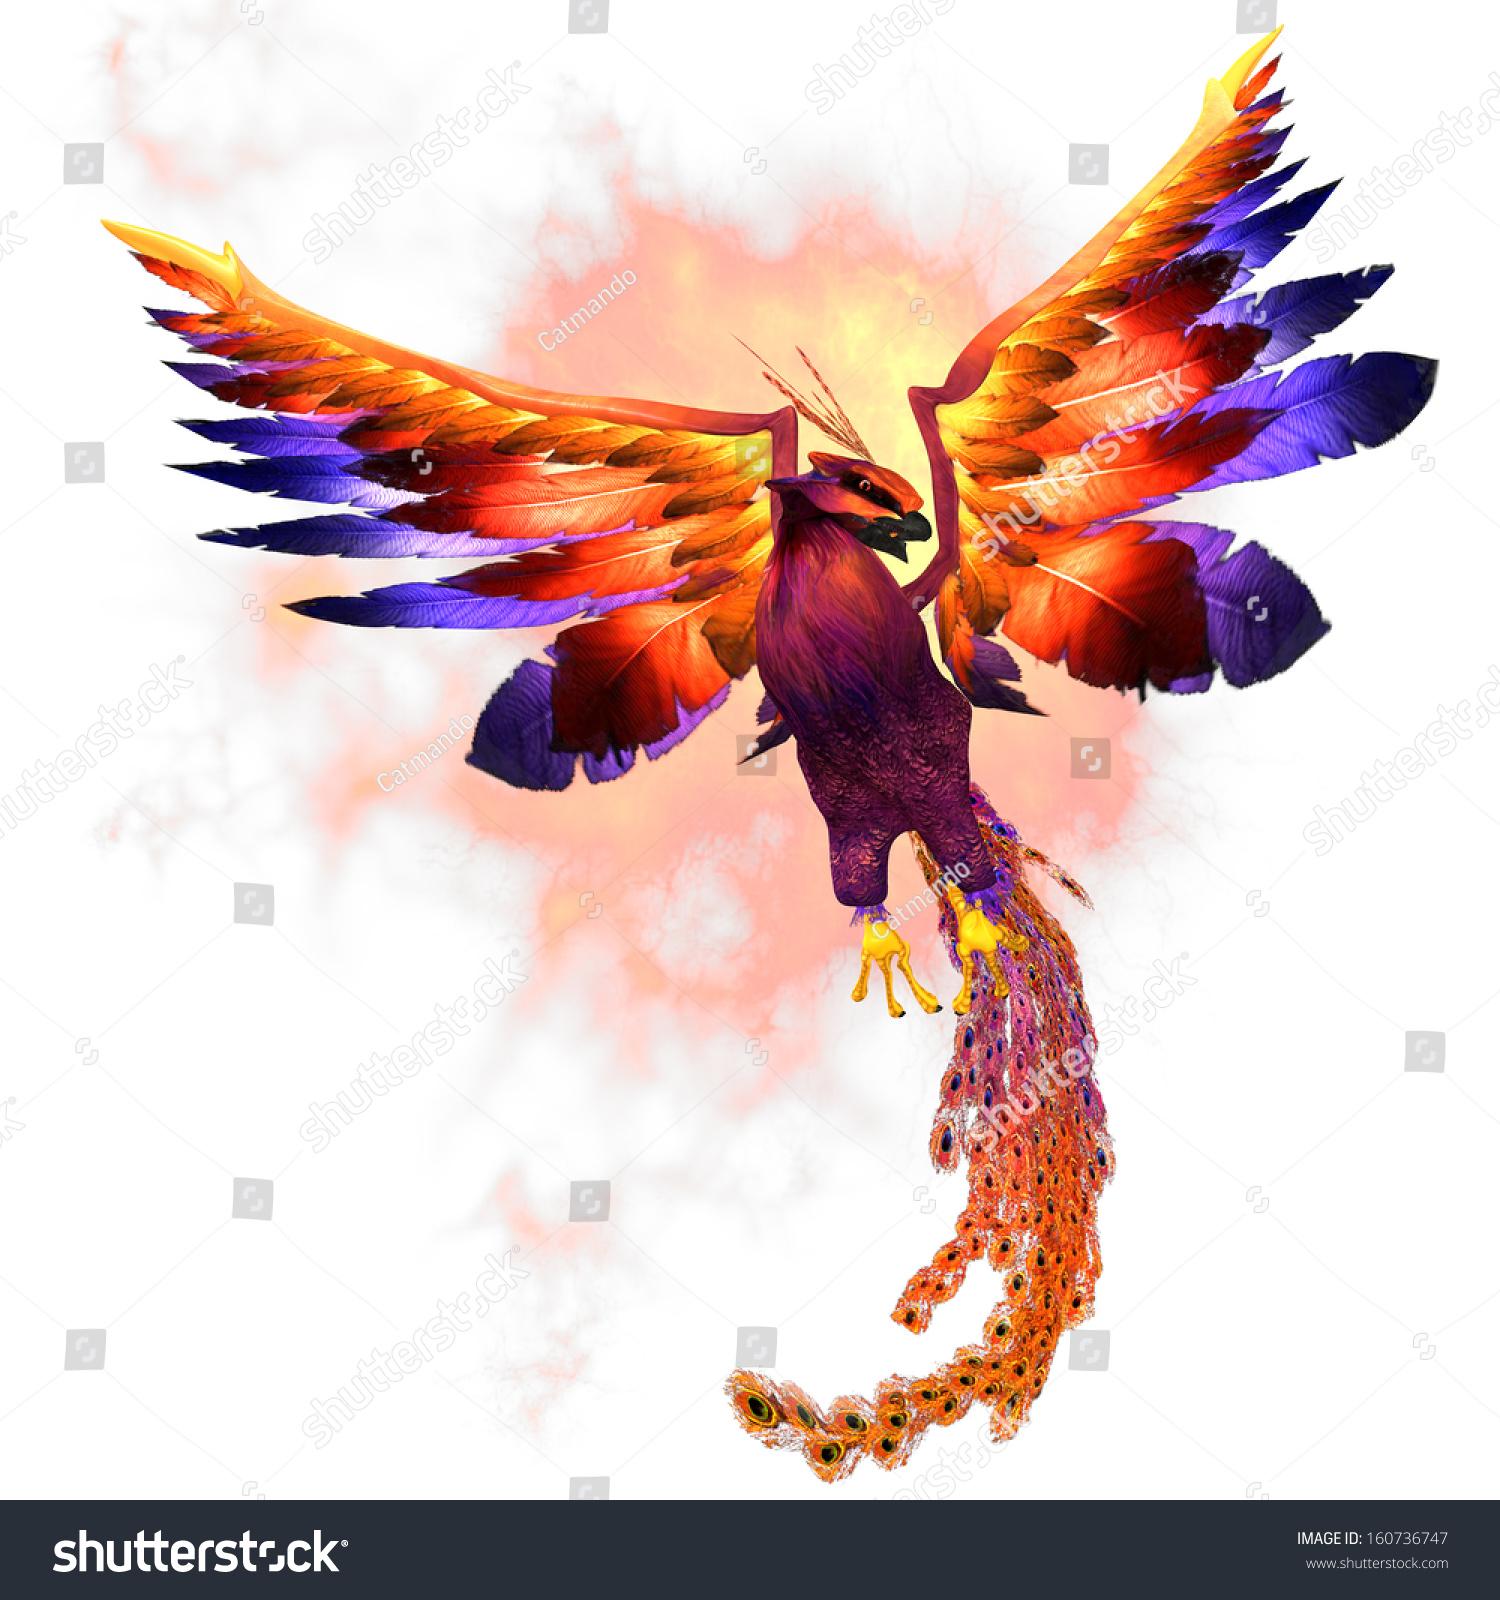 Phoenix Rising Phoenix Firebird Mythical Symbol Stock Illustration